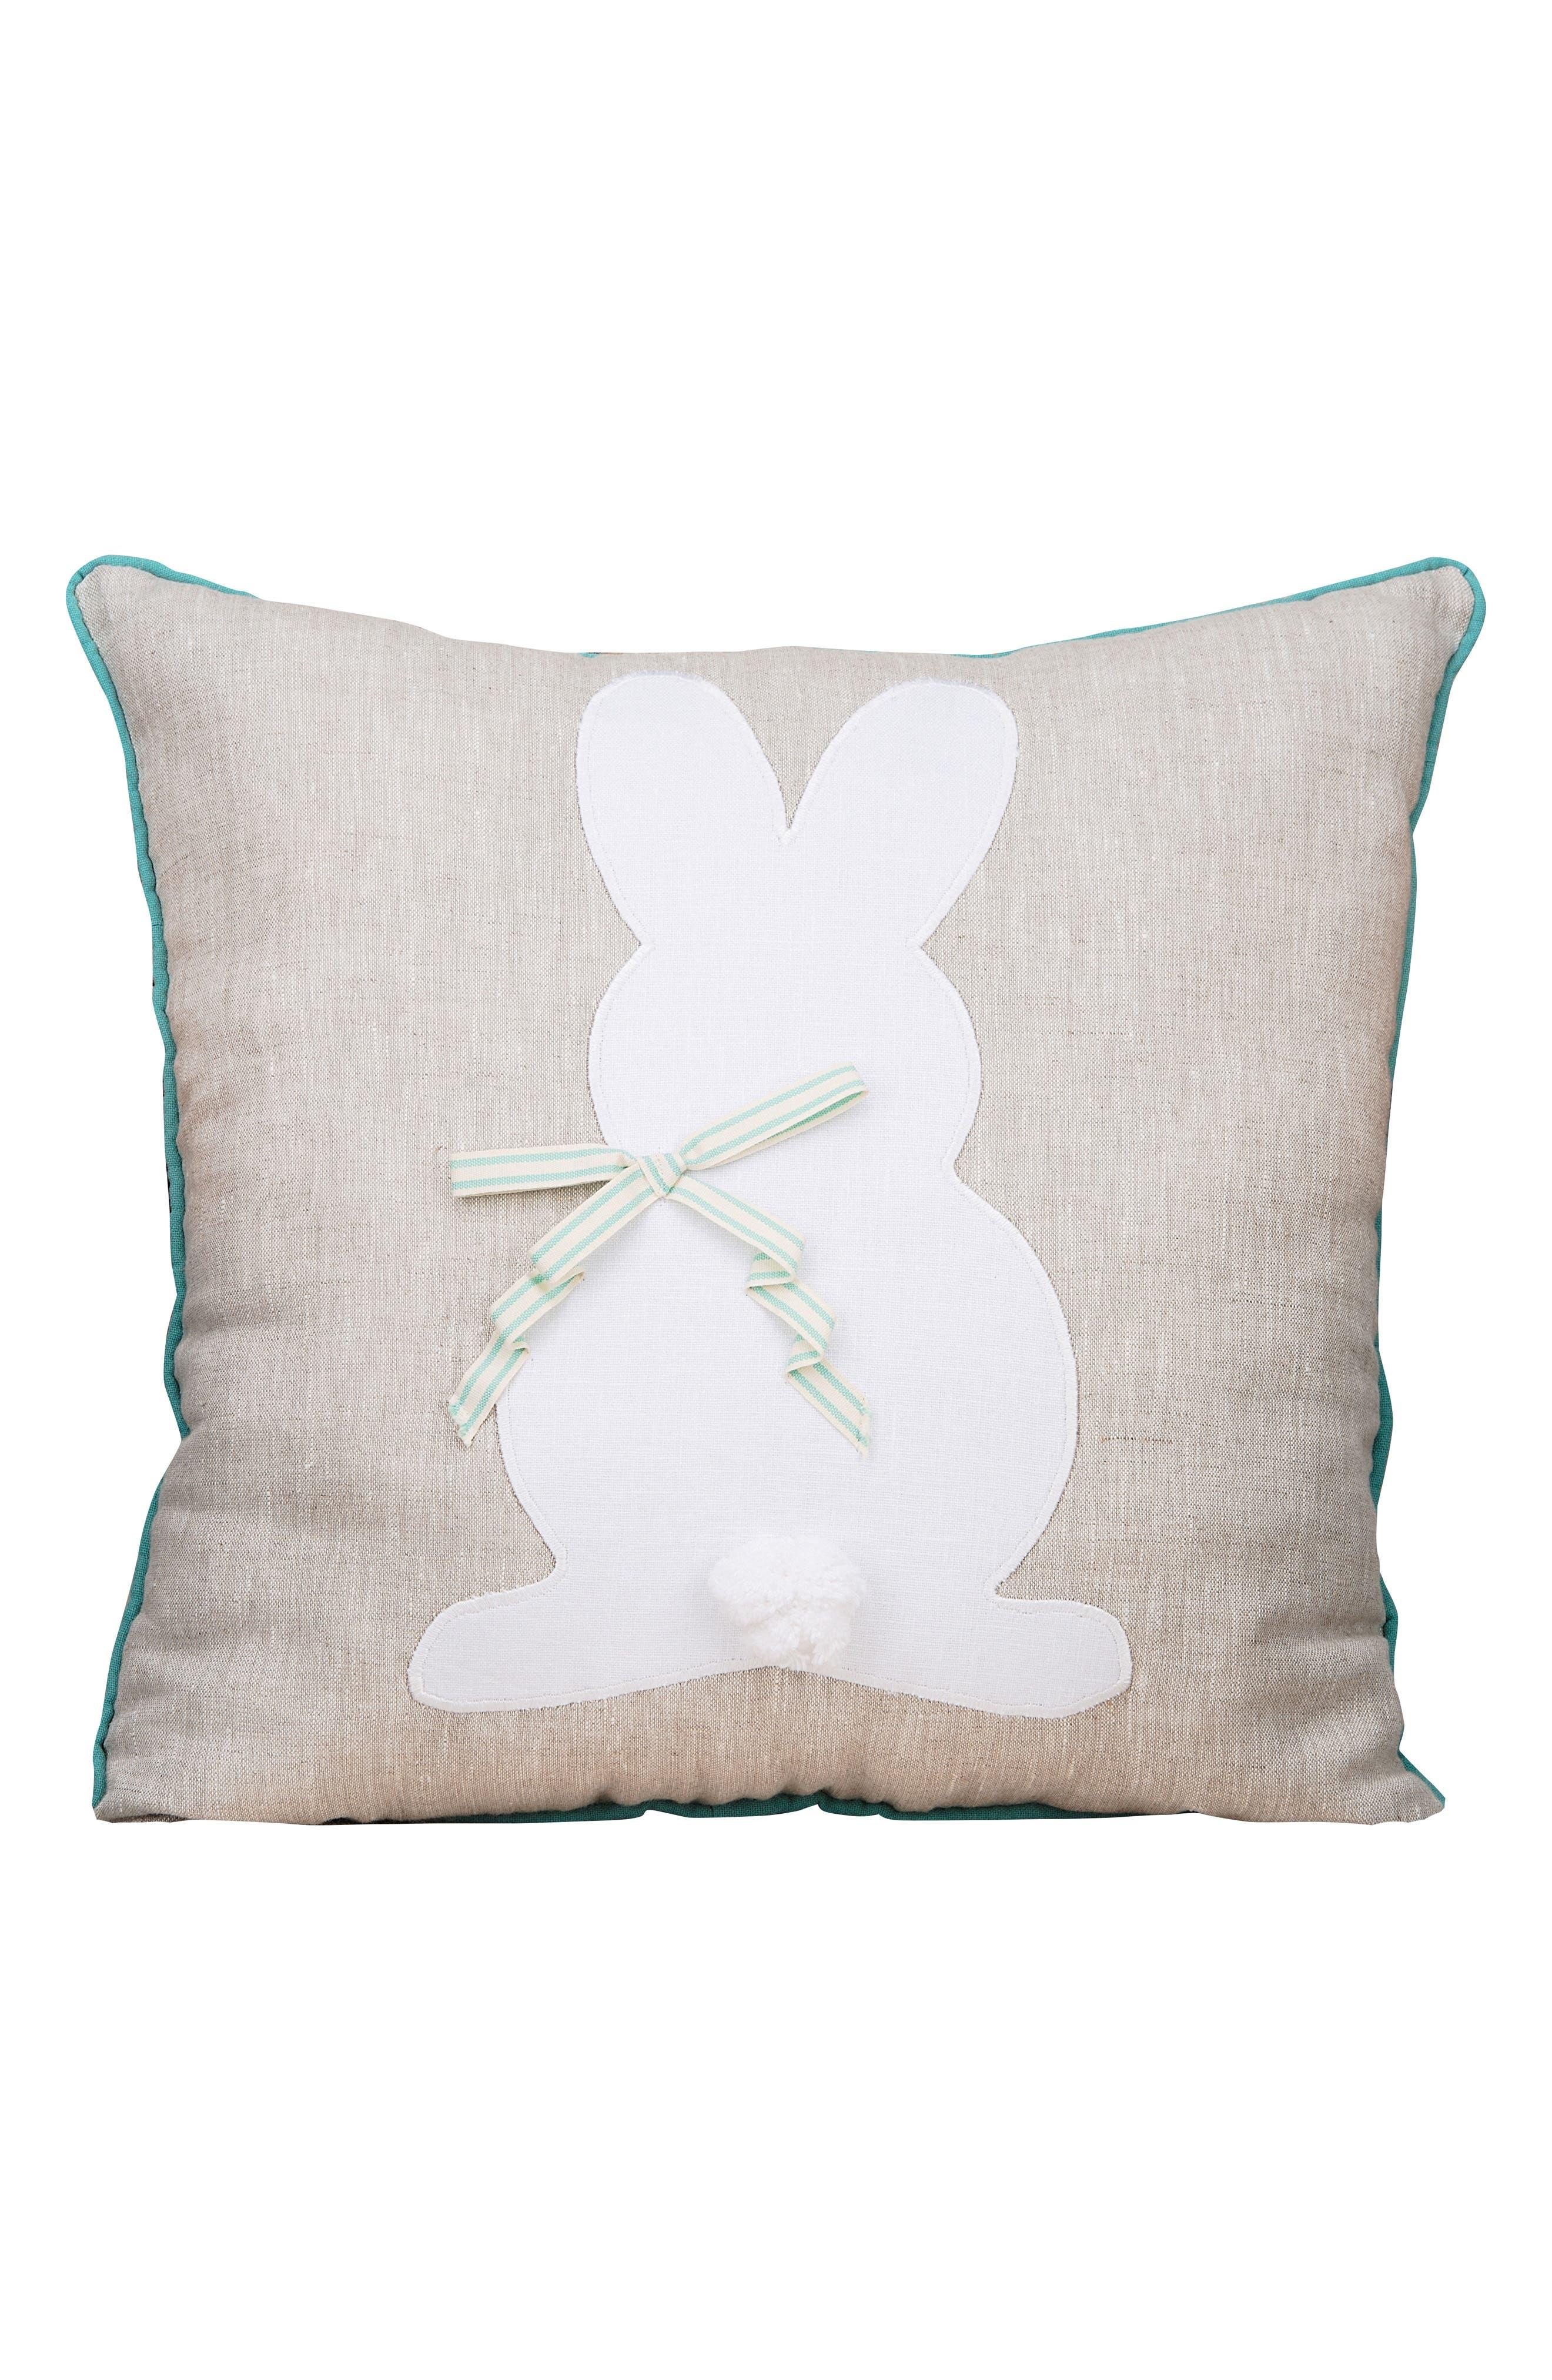 Glory Haux Bunny Pillow